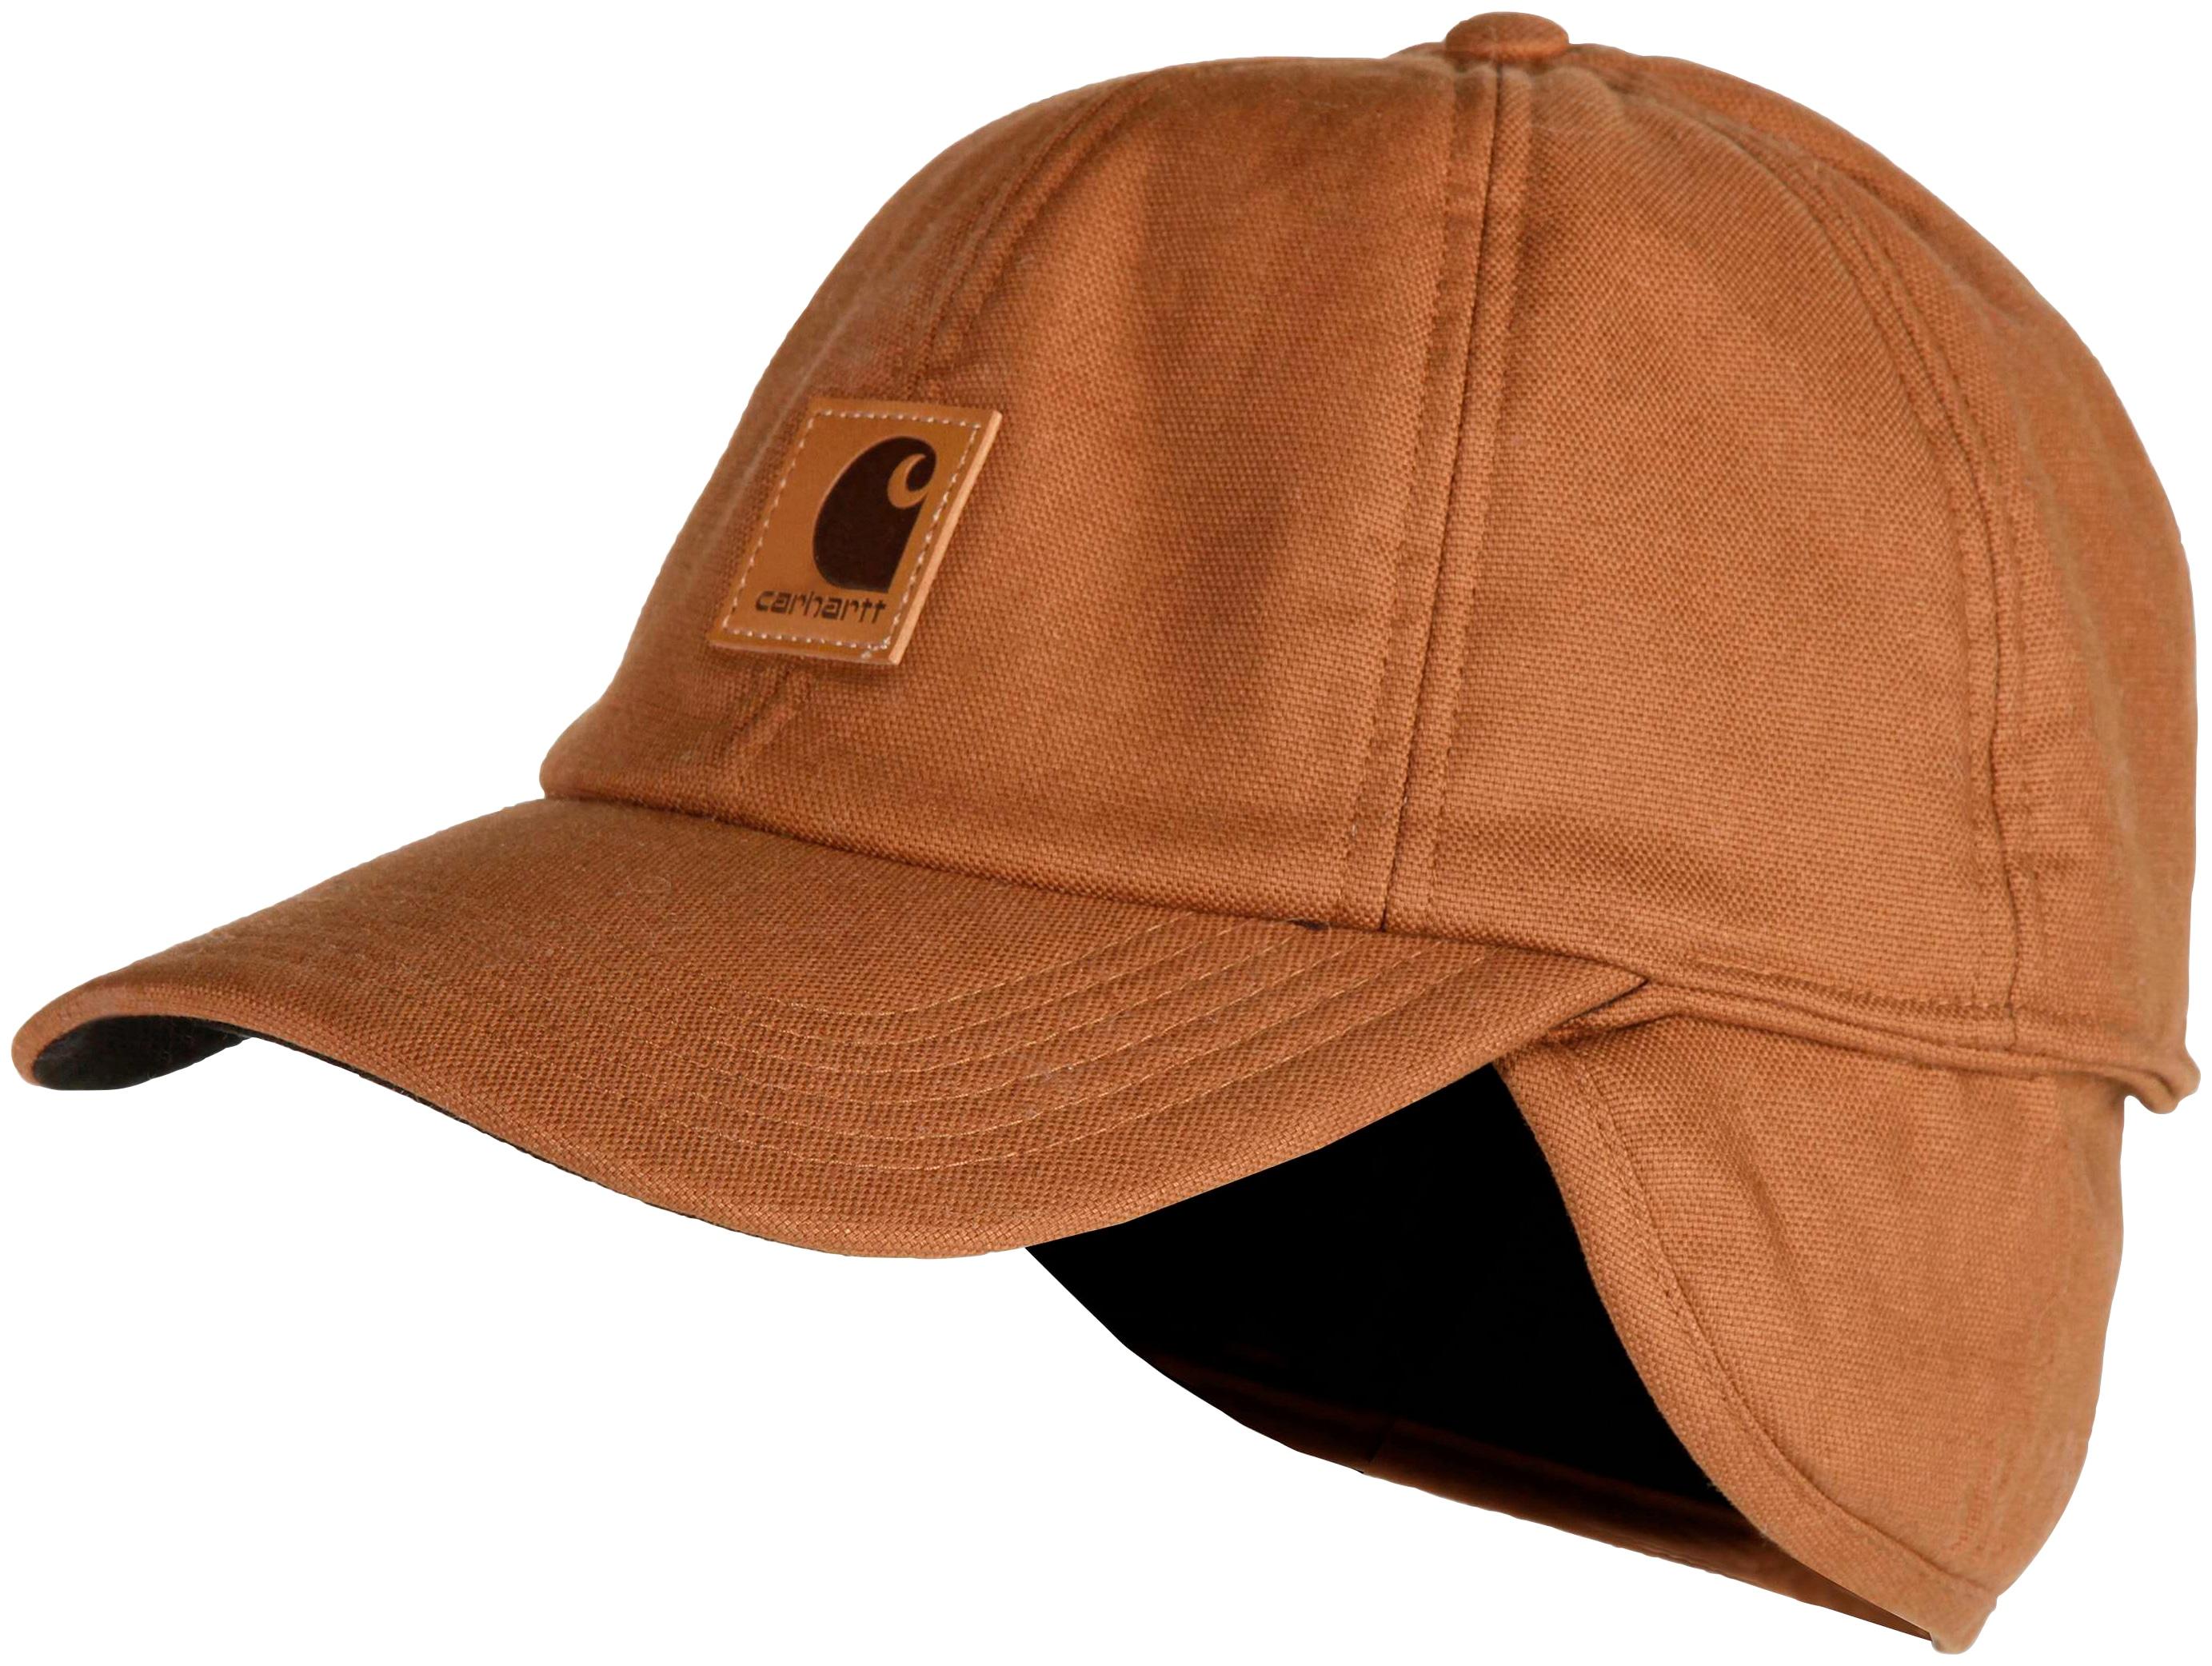 carhartt -  Fitted Cap Stretch Fitted Ear-Flap Cap